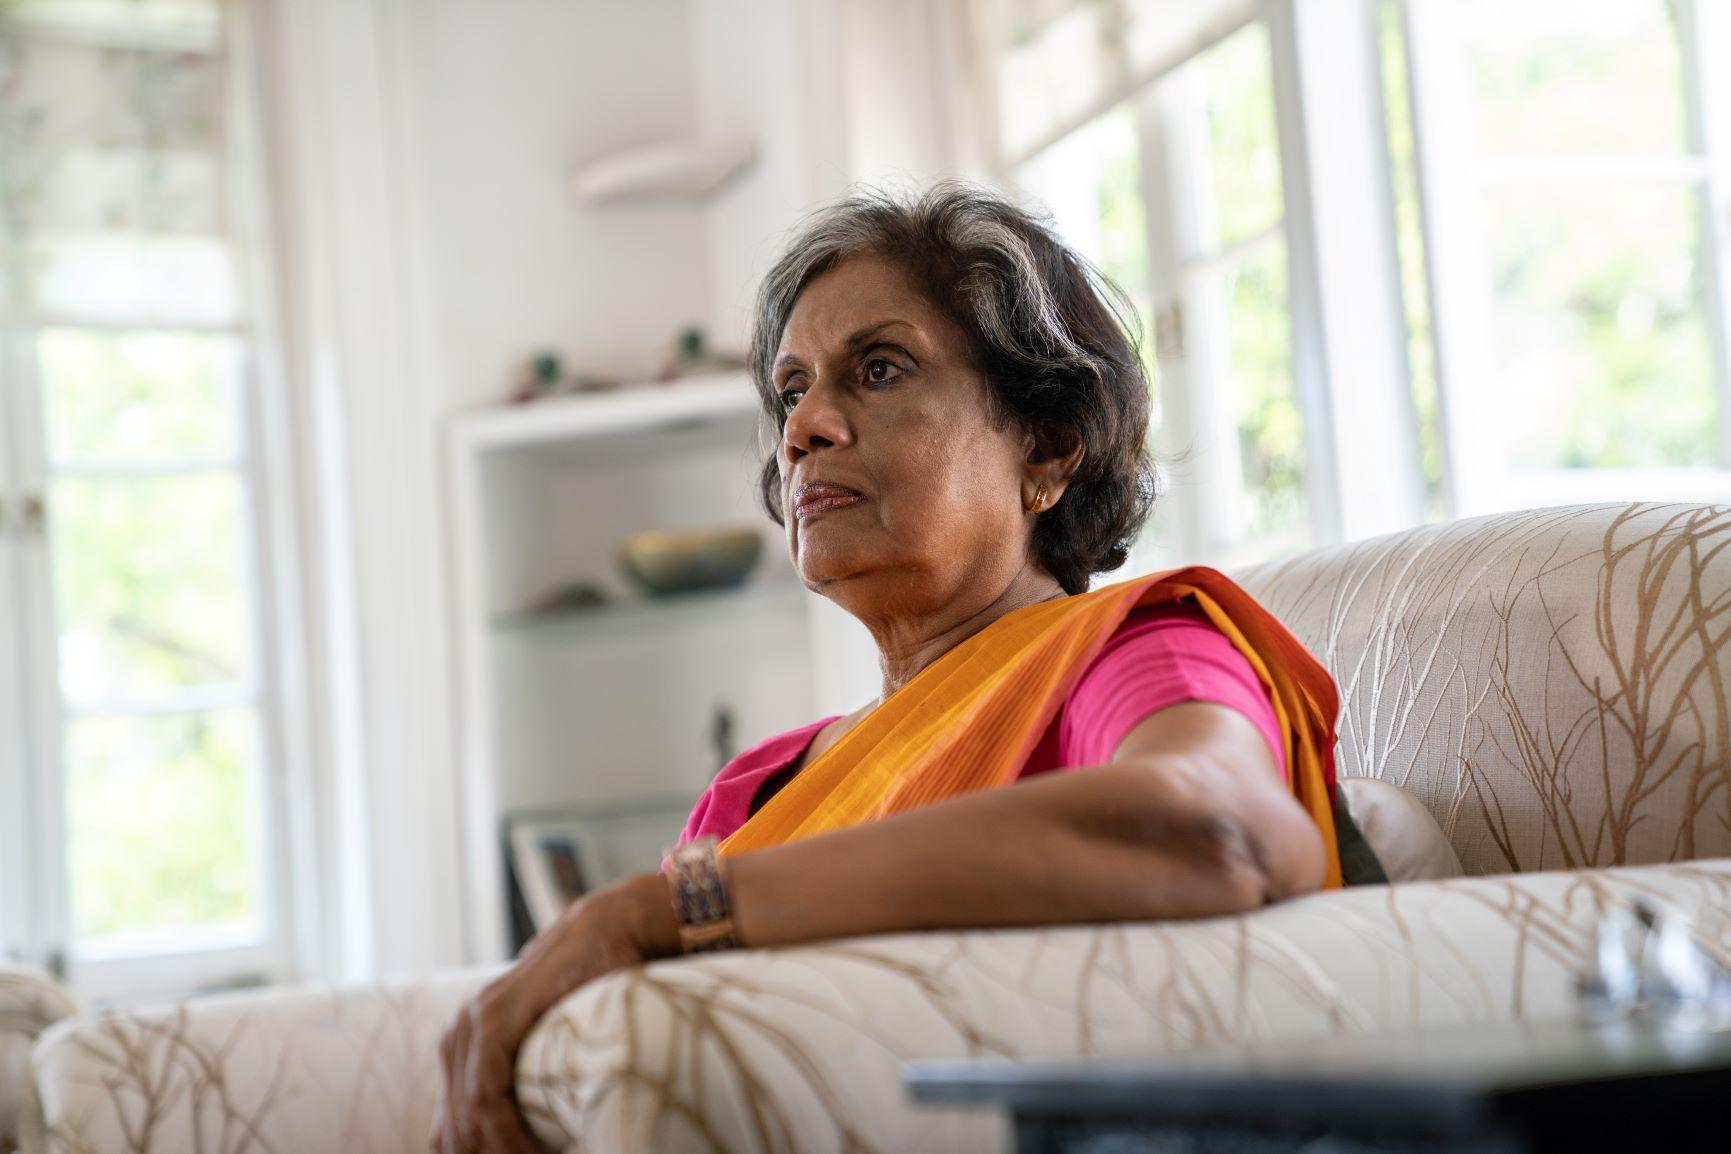 President Chandrika Bandaranaike Kumaratunga - Former President of Sri Lanka (1994-2005) and 2019 Common Ground Awardee